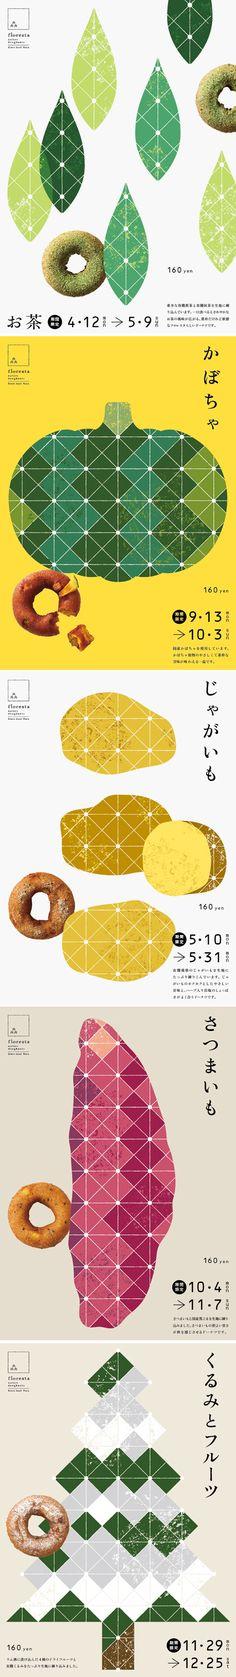 floresta donuts poster: design by Satoshi Kondo, illustration by Ryoji Nakajima: asatte 明後日デザイン制作所, 2011